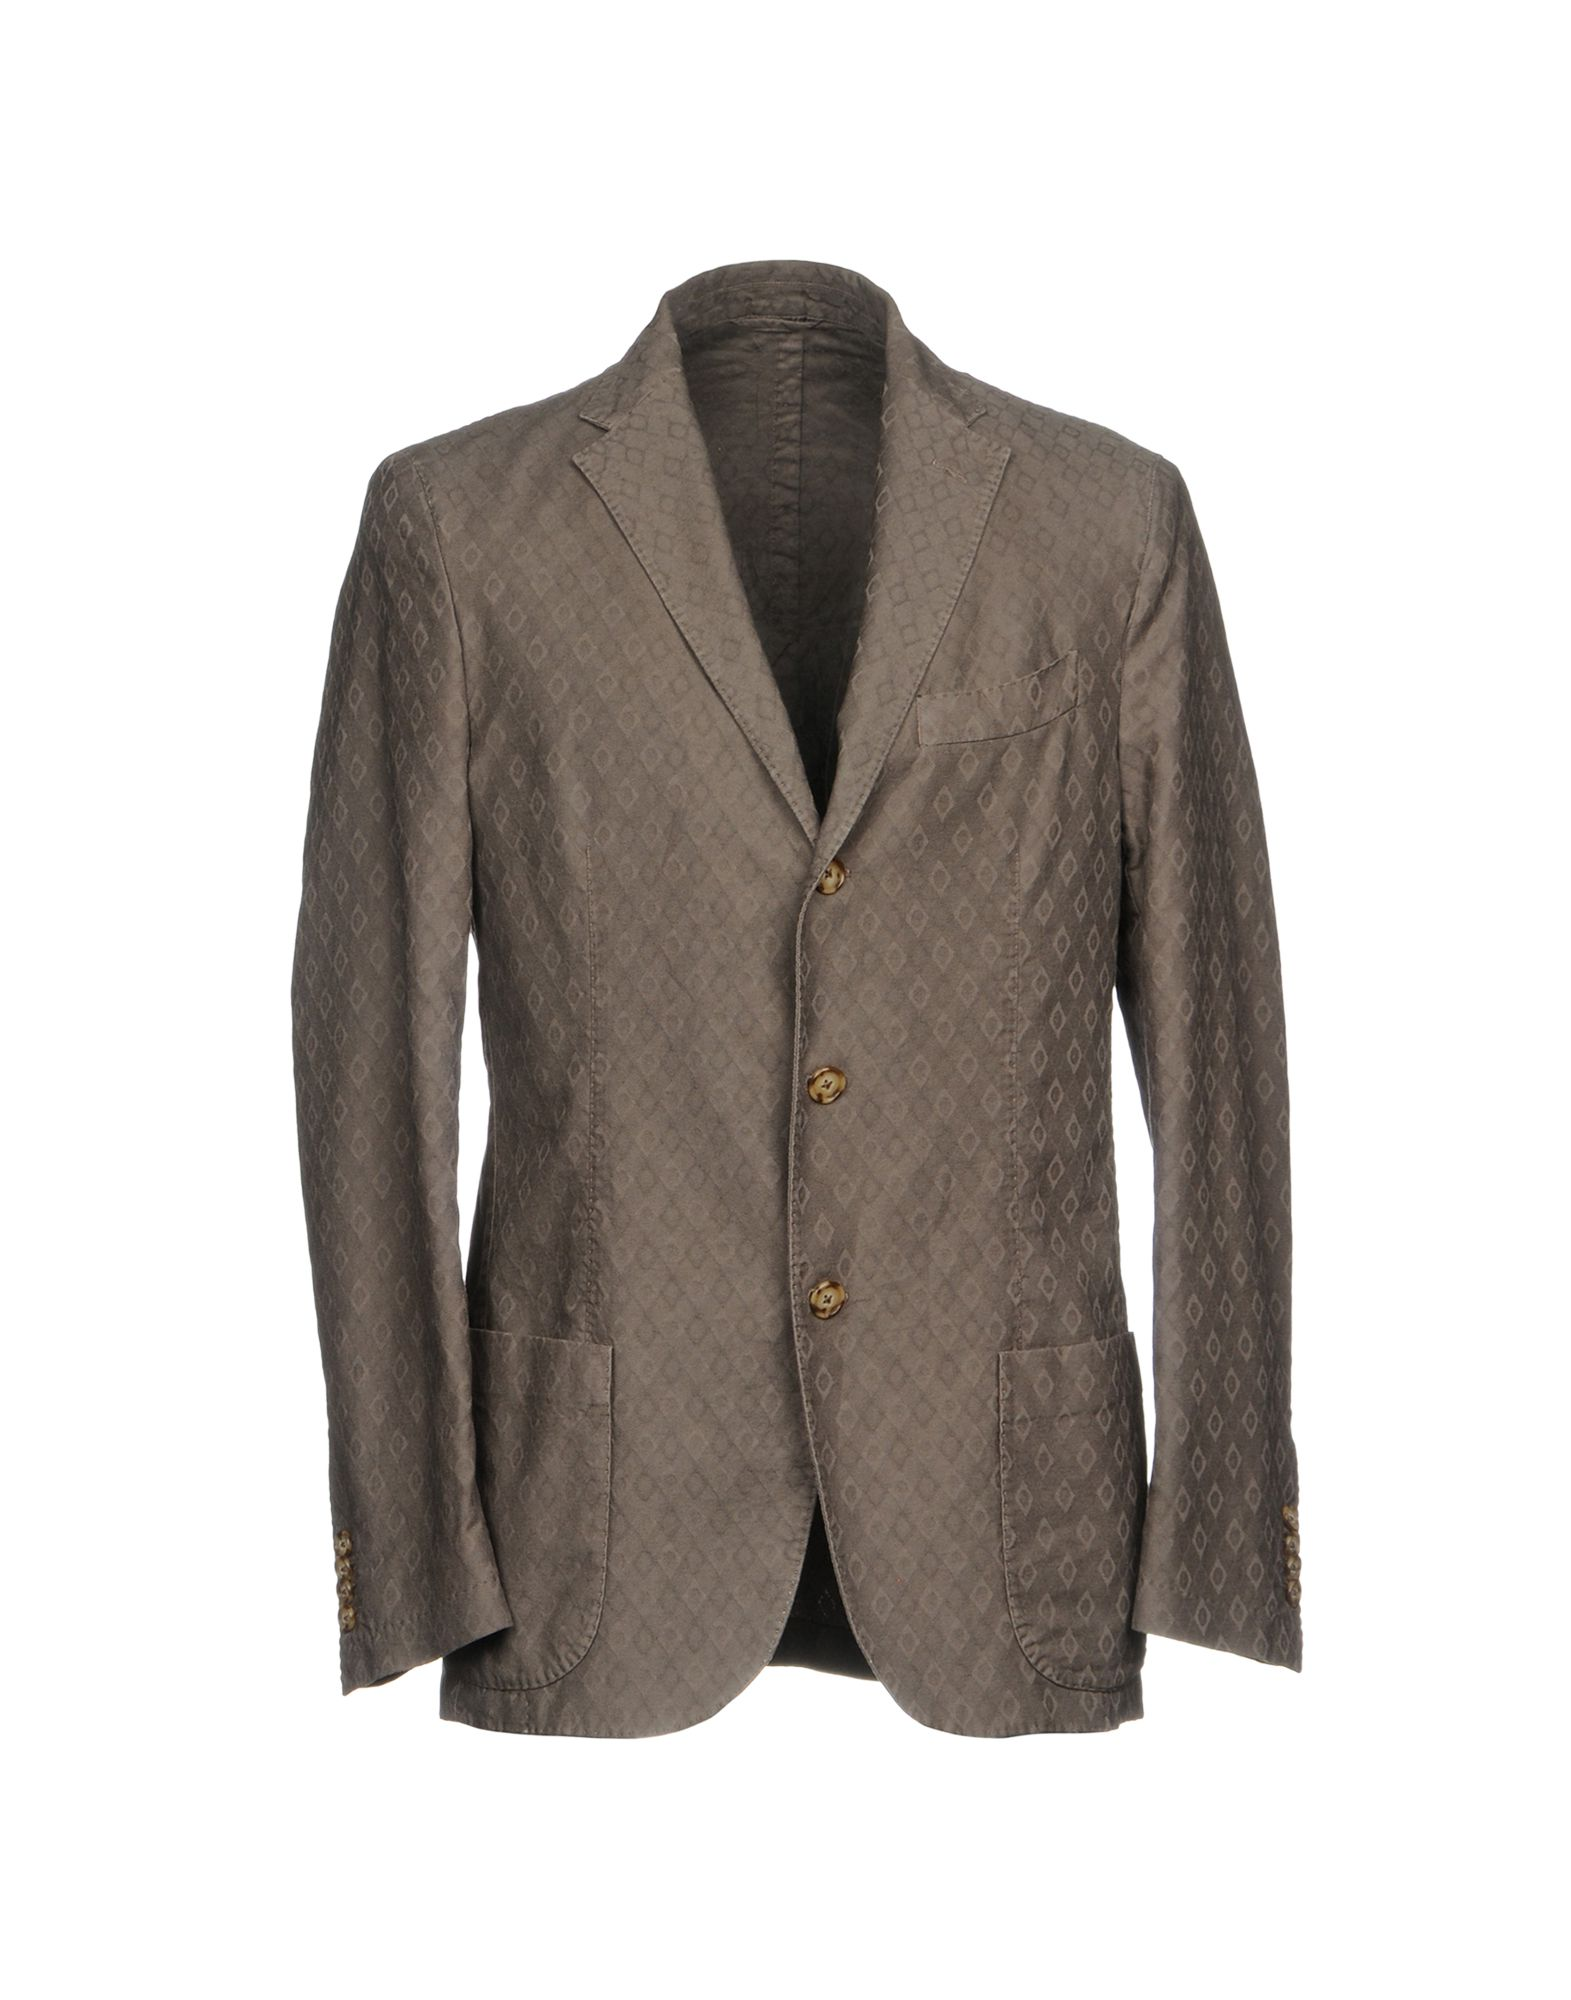 ALTEA dal 1973 Пиджак altea dal 1973 джинсовая рубашка